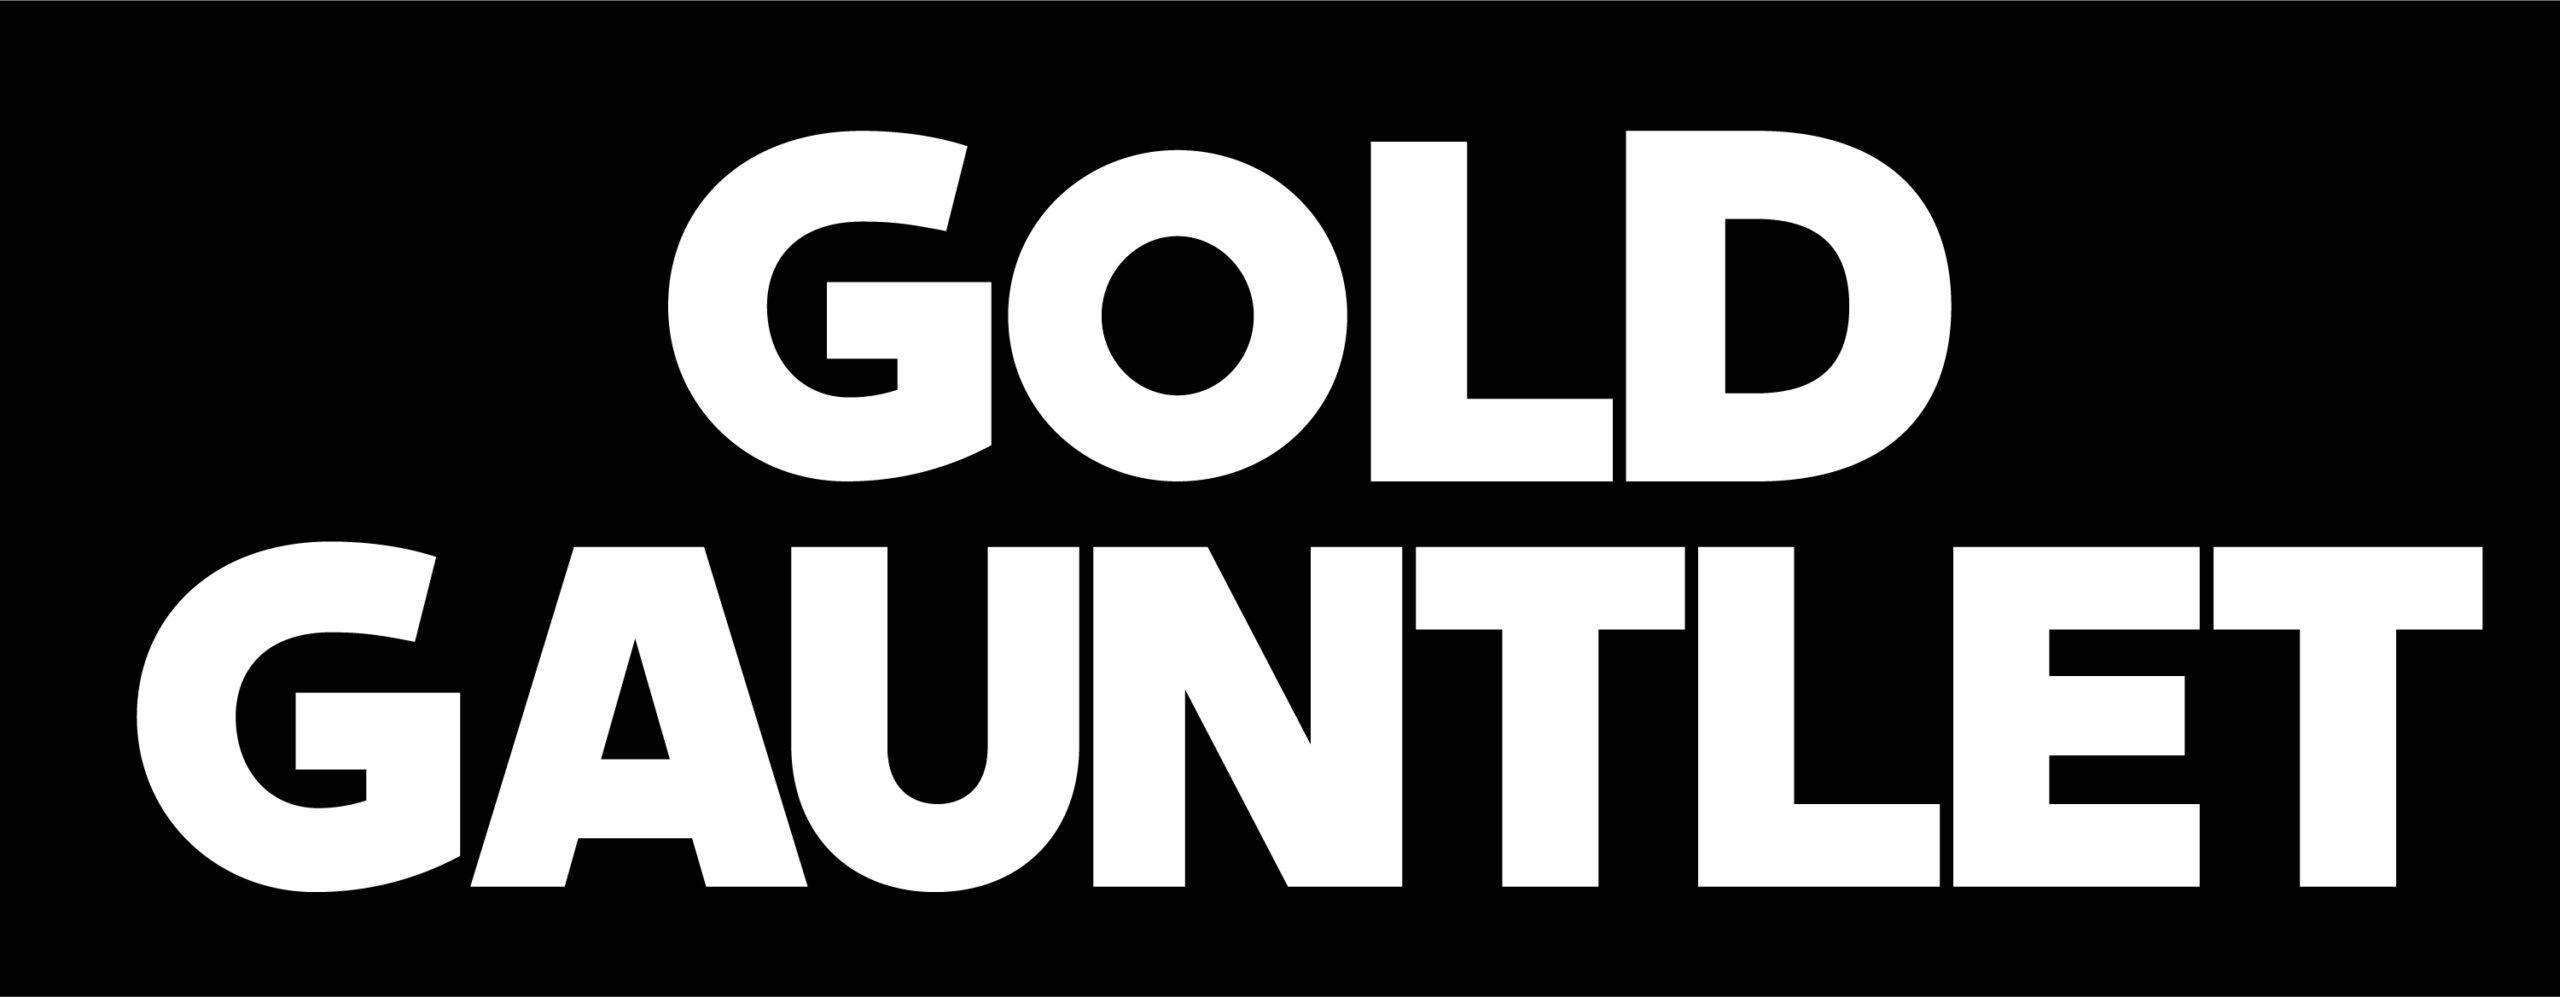 Gold_Gauntlet_Logo-ondrk